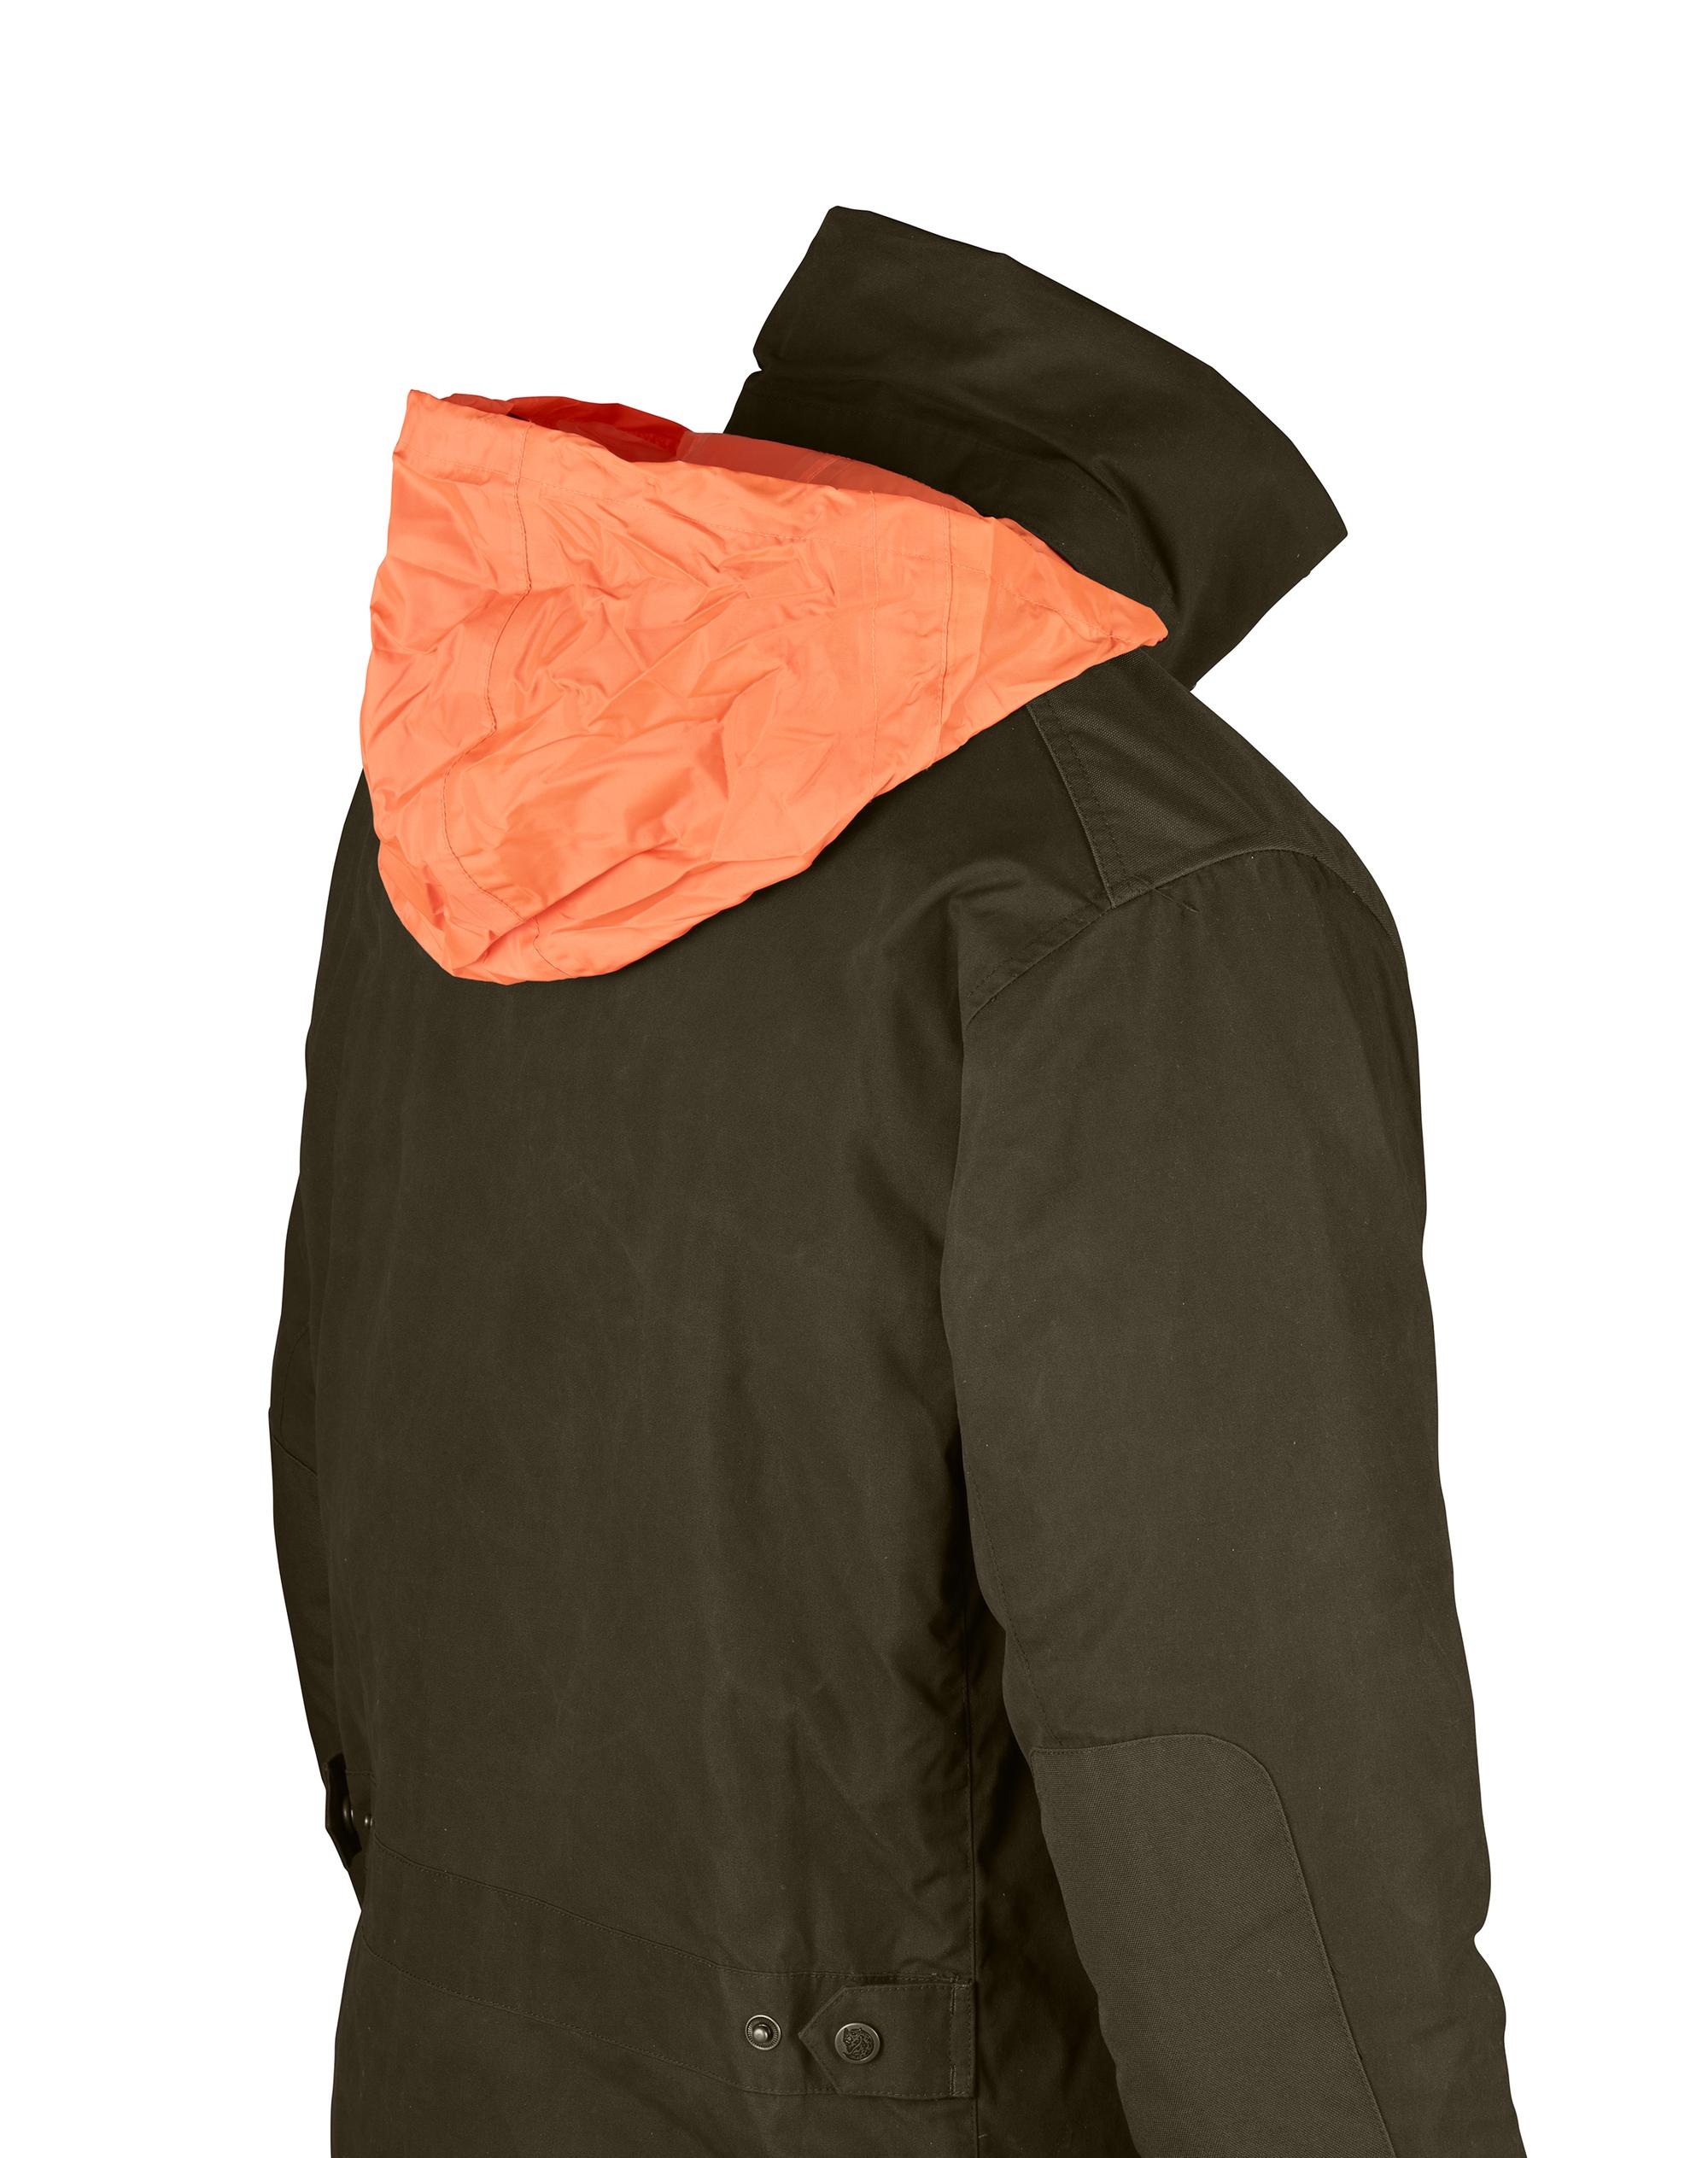 Fj/ällr/även Herren S/örmland Shirt Jacket Jacke